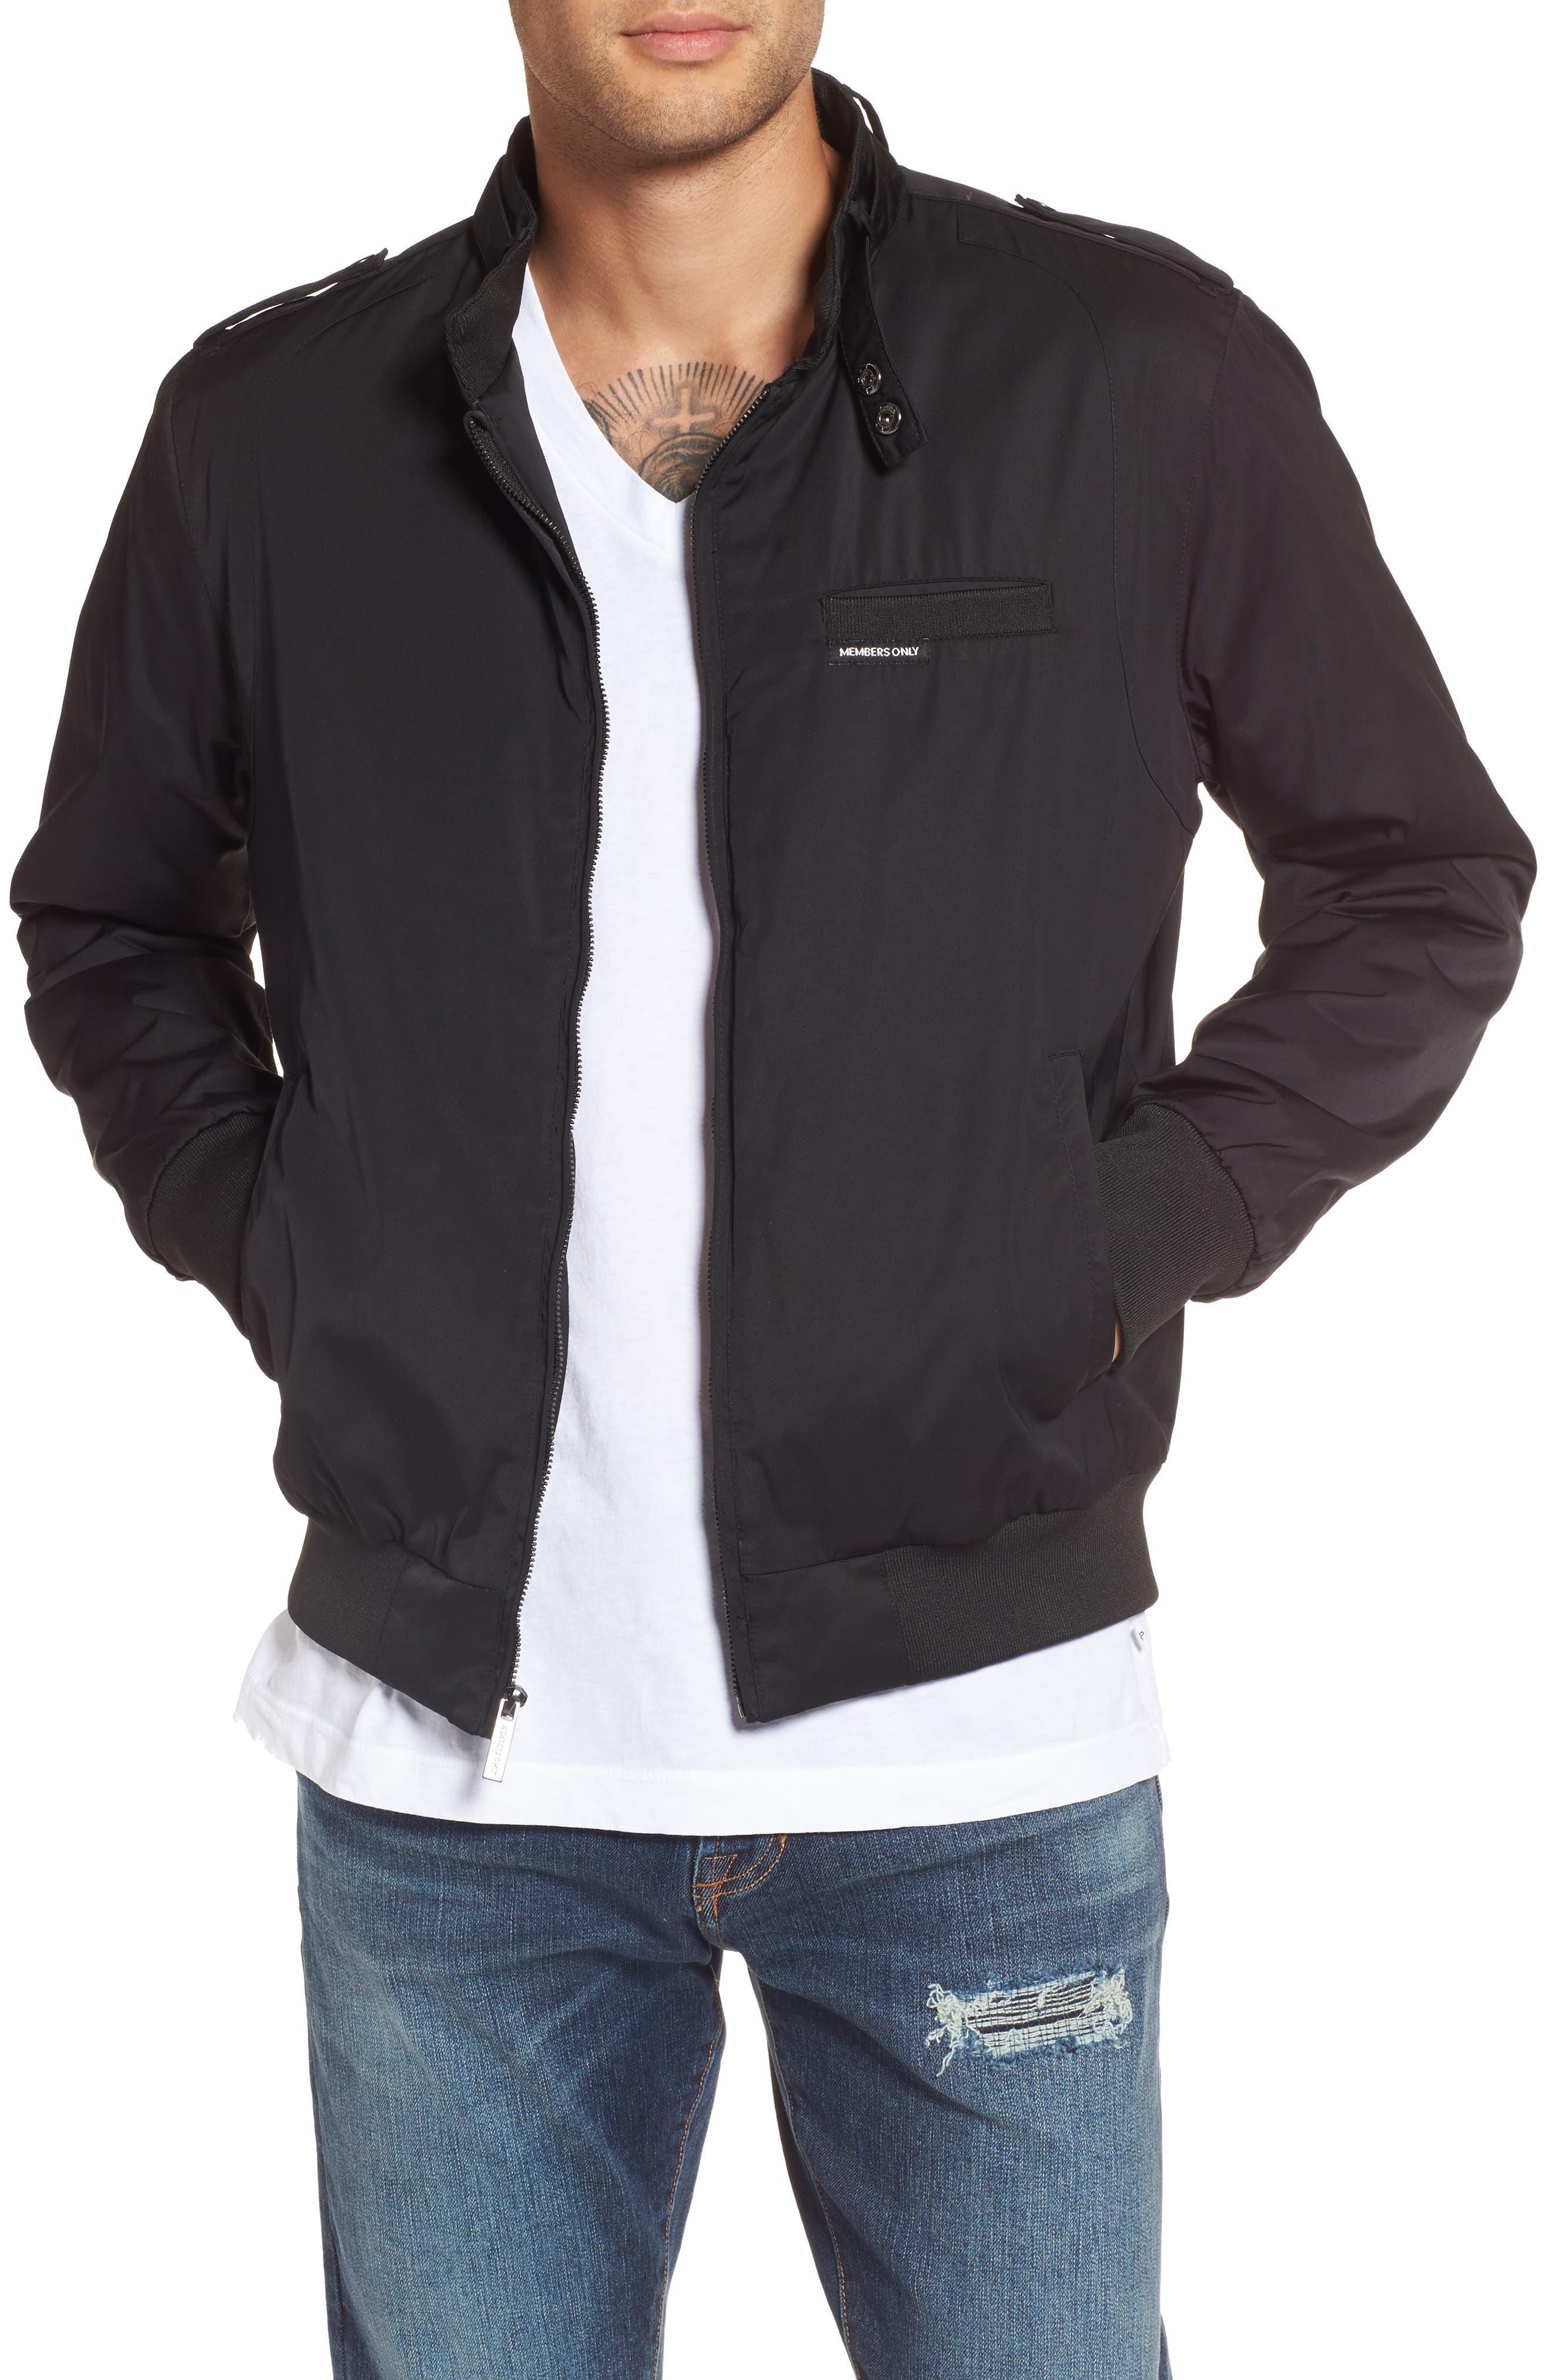 Twill Iconic Jacket,                             Main thumbnail 1, color,                             001